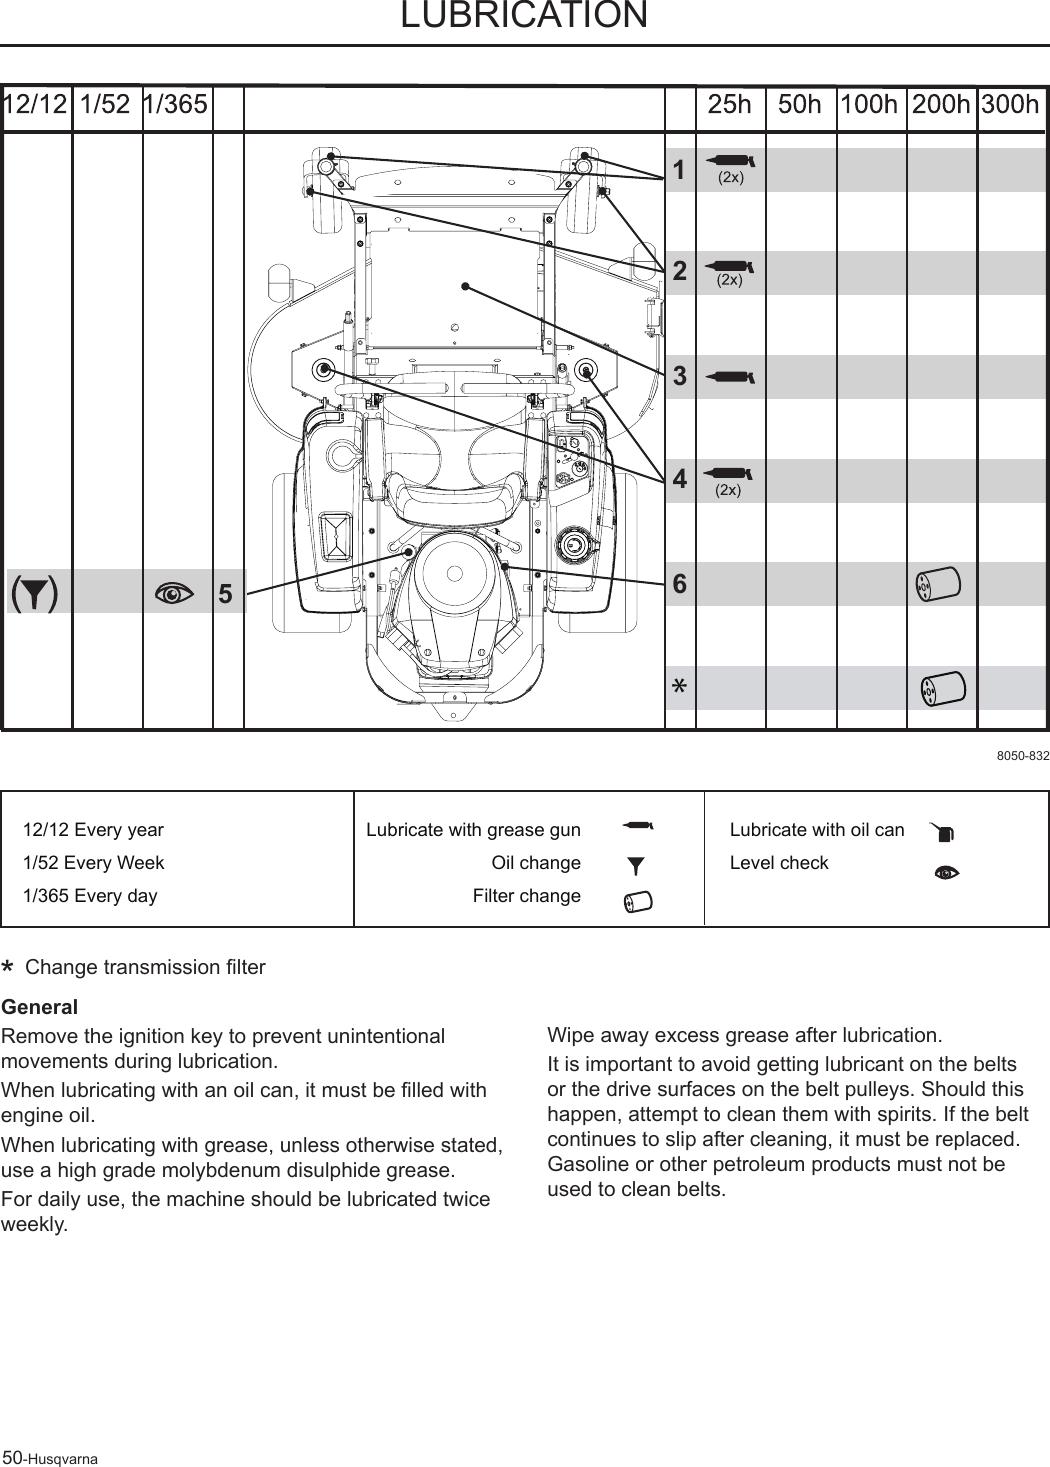 Husqvarna Lawn Mower Ez4824 965880401 Users Manual OM, EZ